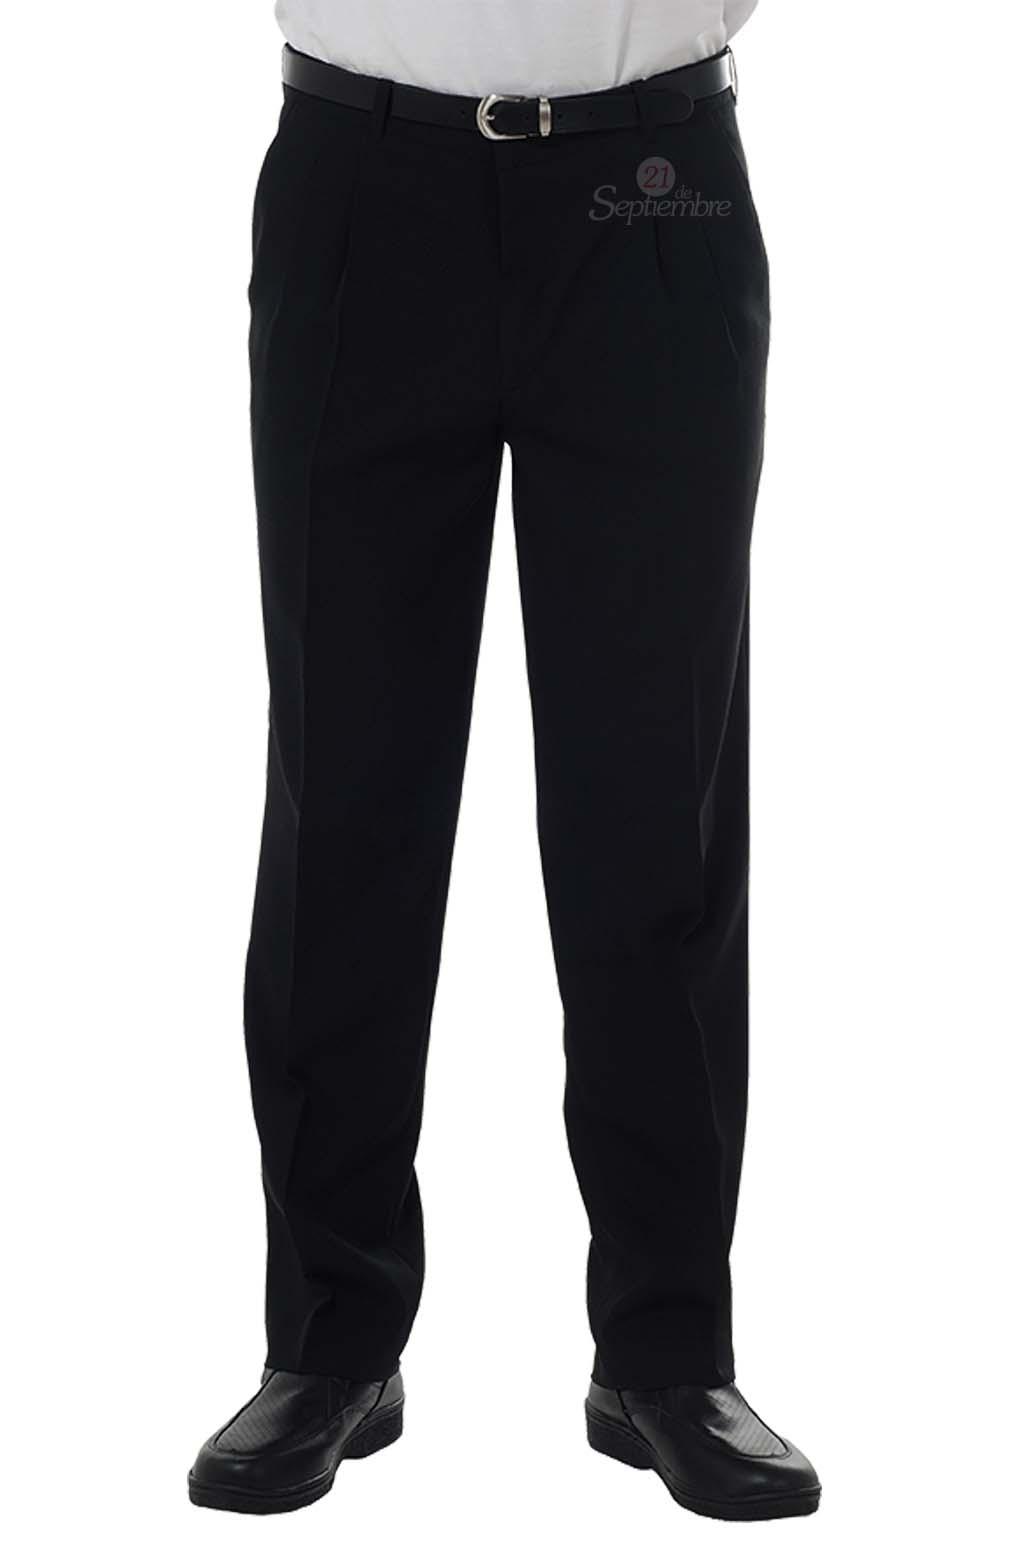 Art 498 Pantalon De Vestir Hombre 21 De Septiembre